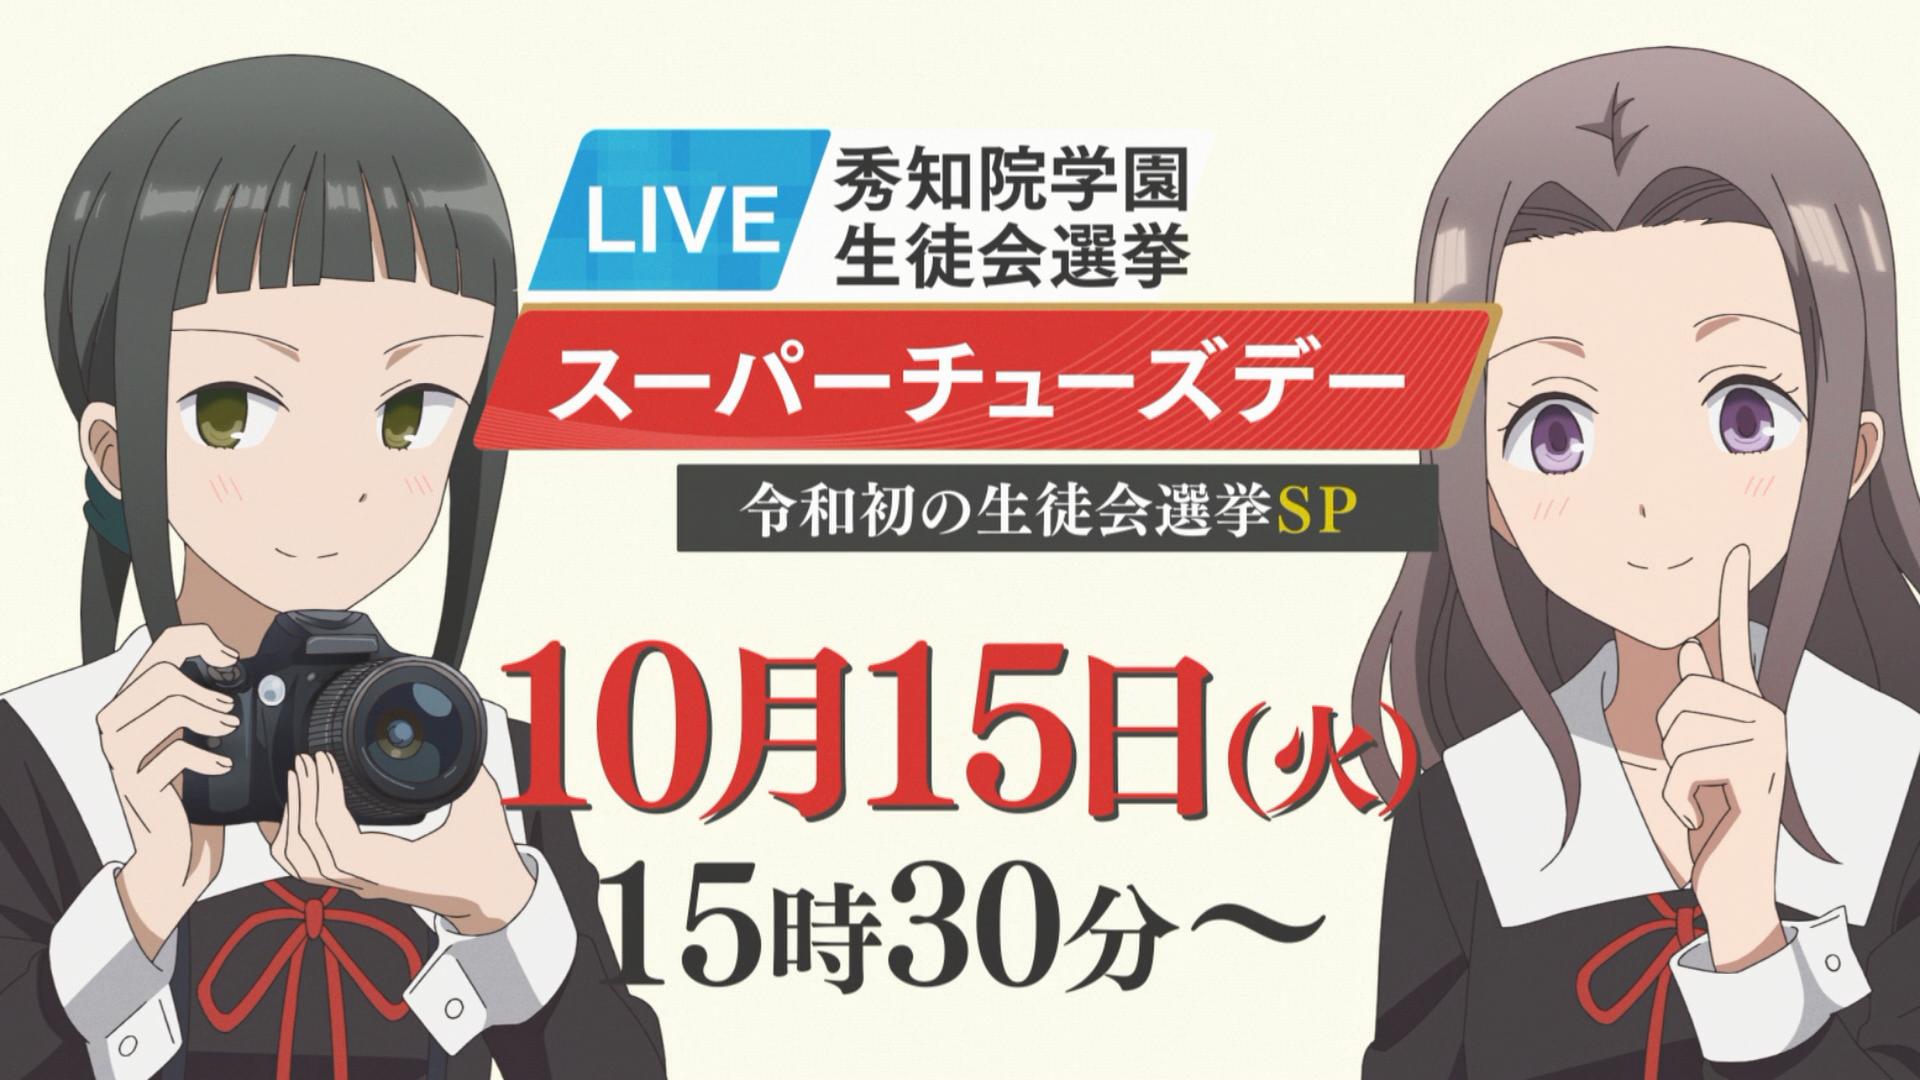 Kaguya-sama-wa-Kokurasetai-S2-05-002410-ELECTION-SUPER-TUESDAY